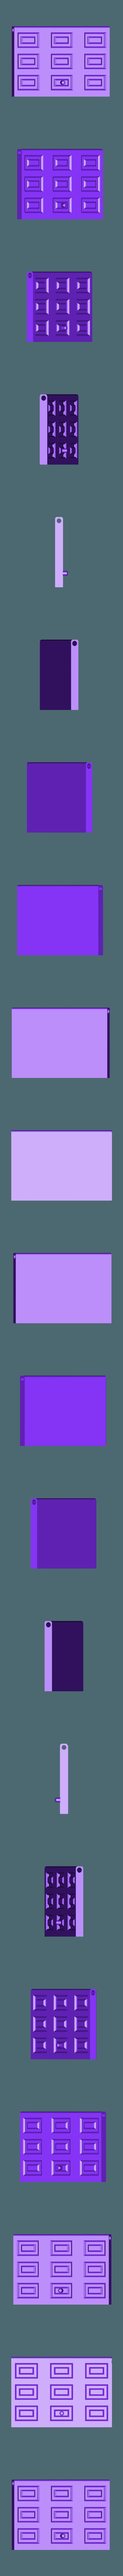 garage_door_1.stl Download STL file SD card storage • 3D printing model, Florisam